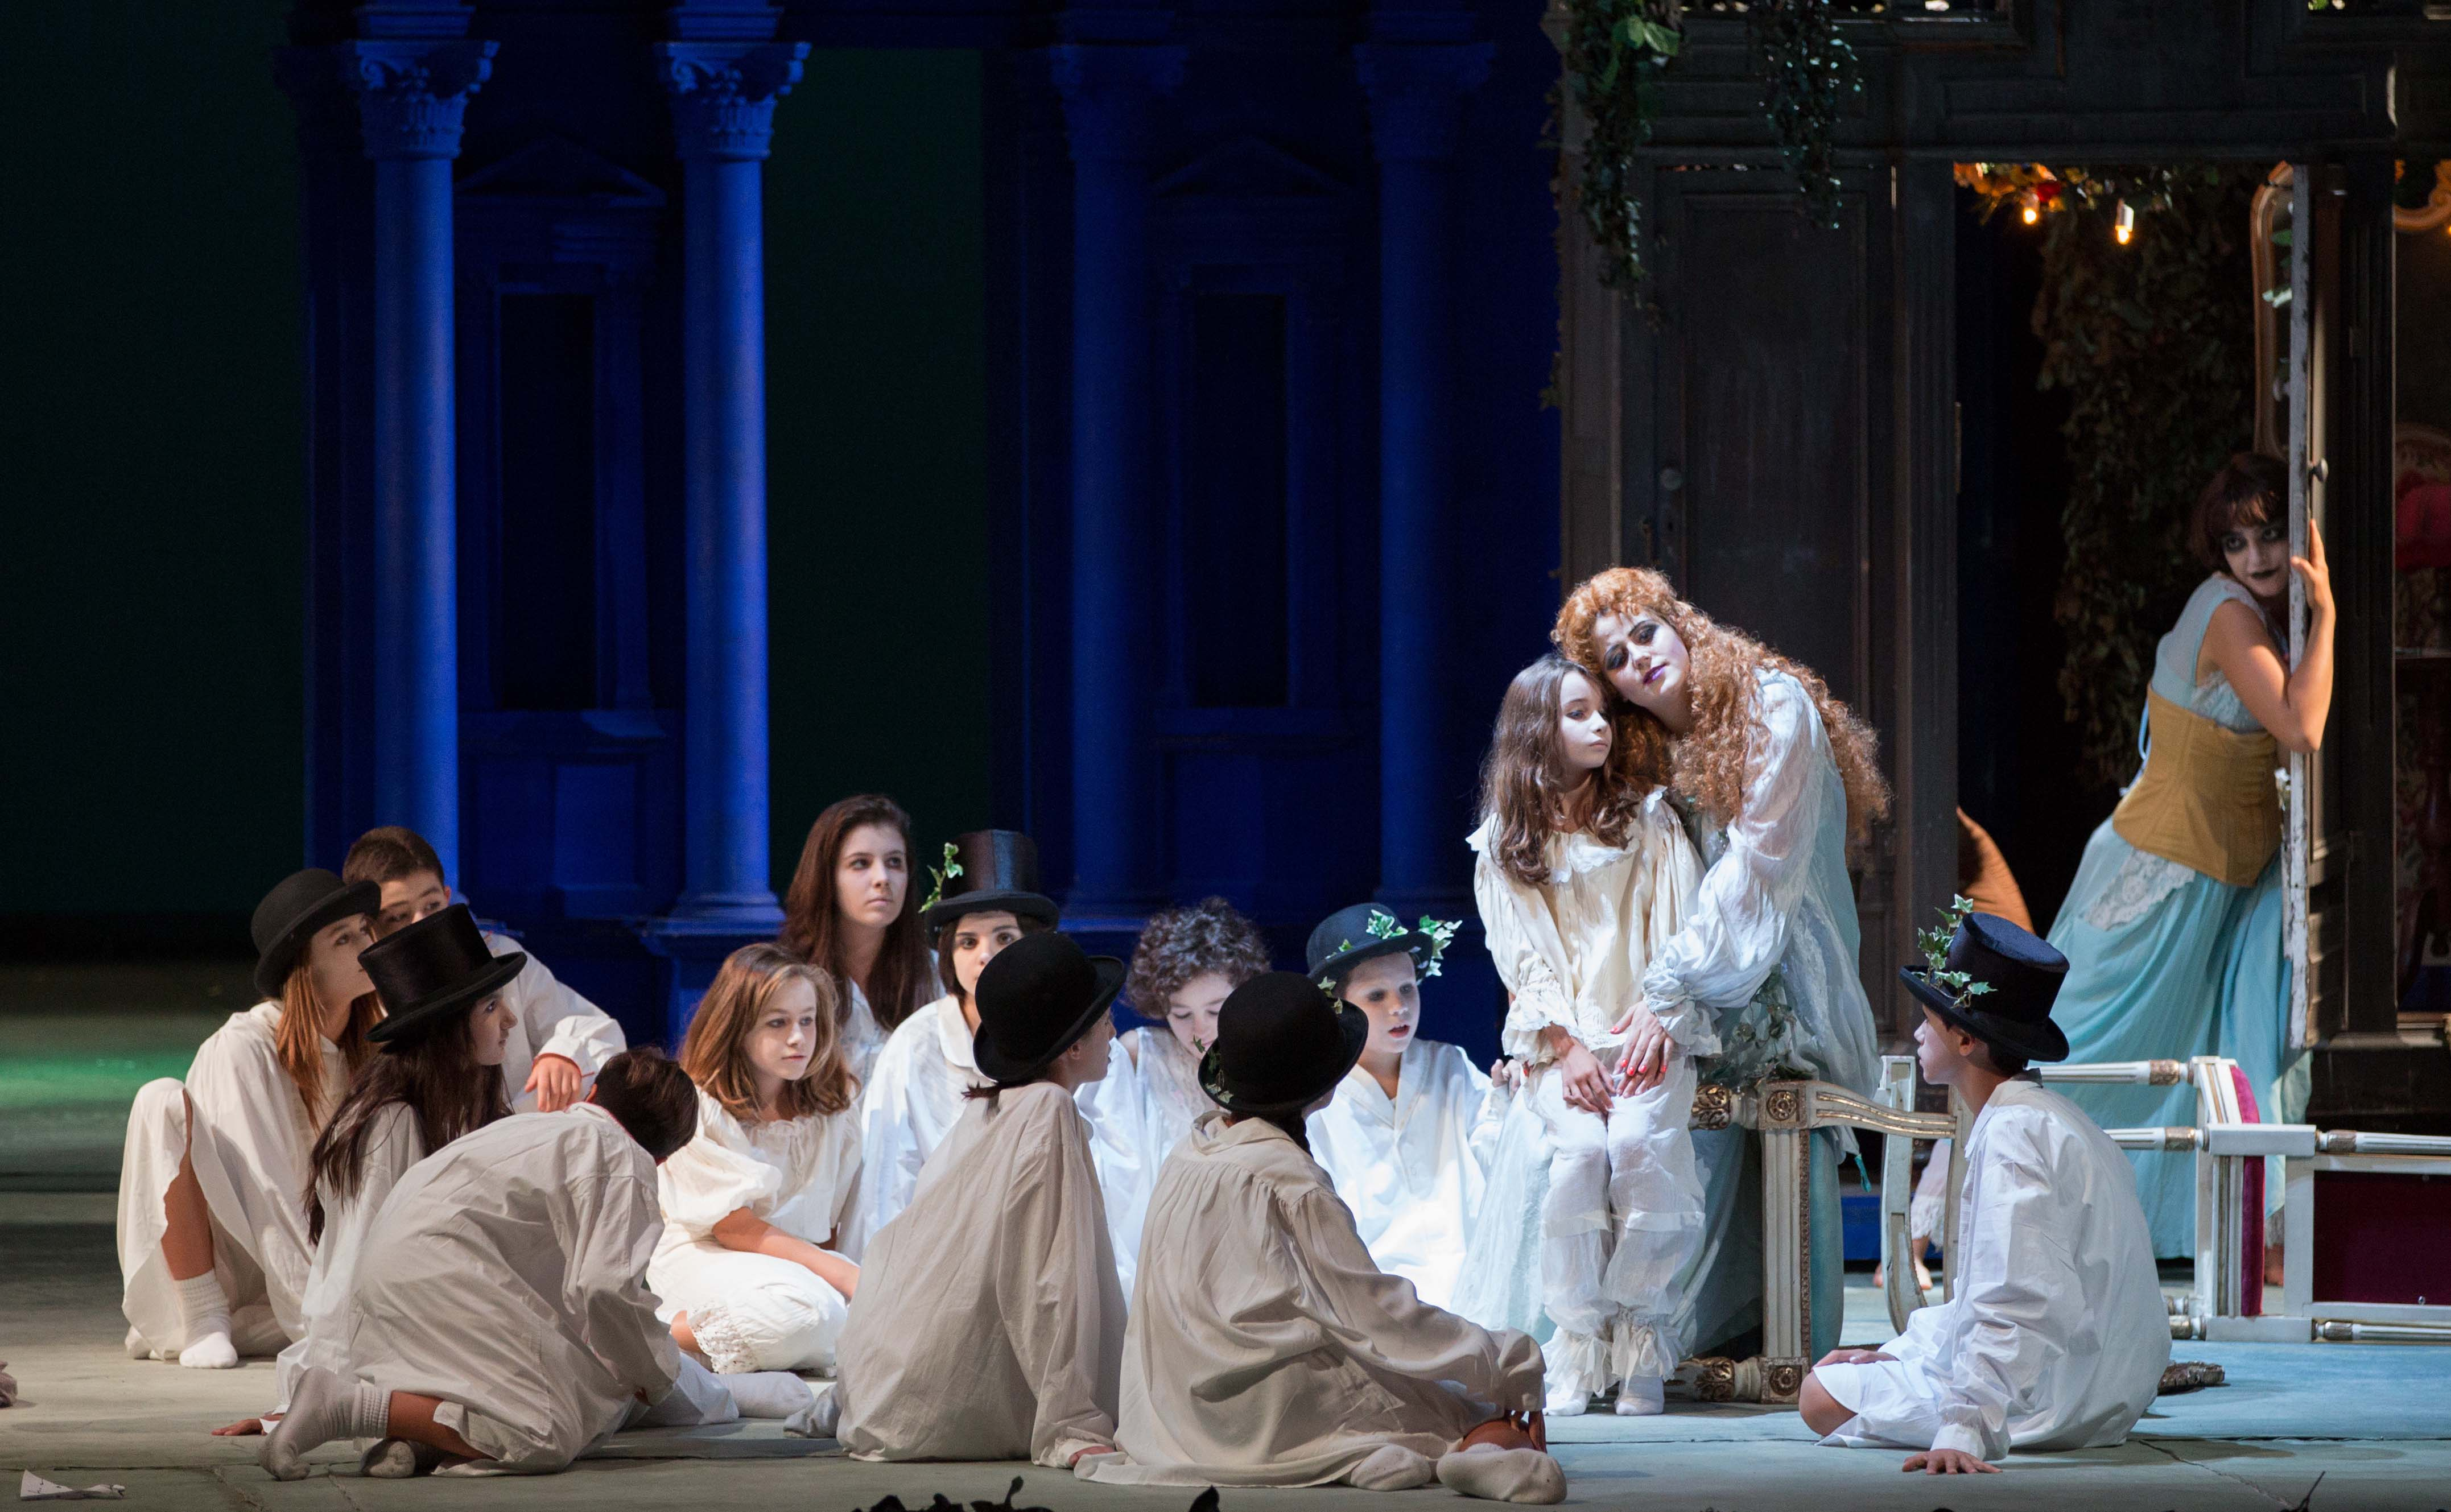 Cremona - Teatro Ponchielli: A Midsummer Night's Dream - credit Teatro Ponchielli di Cremona